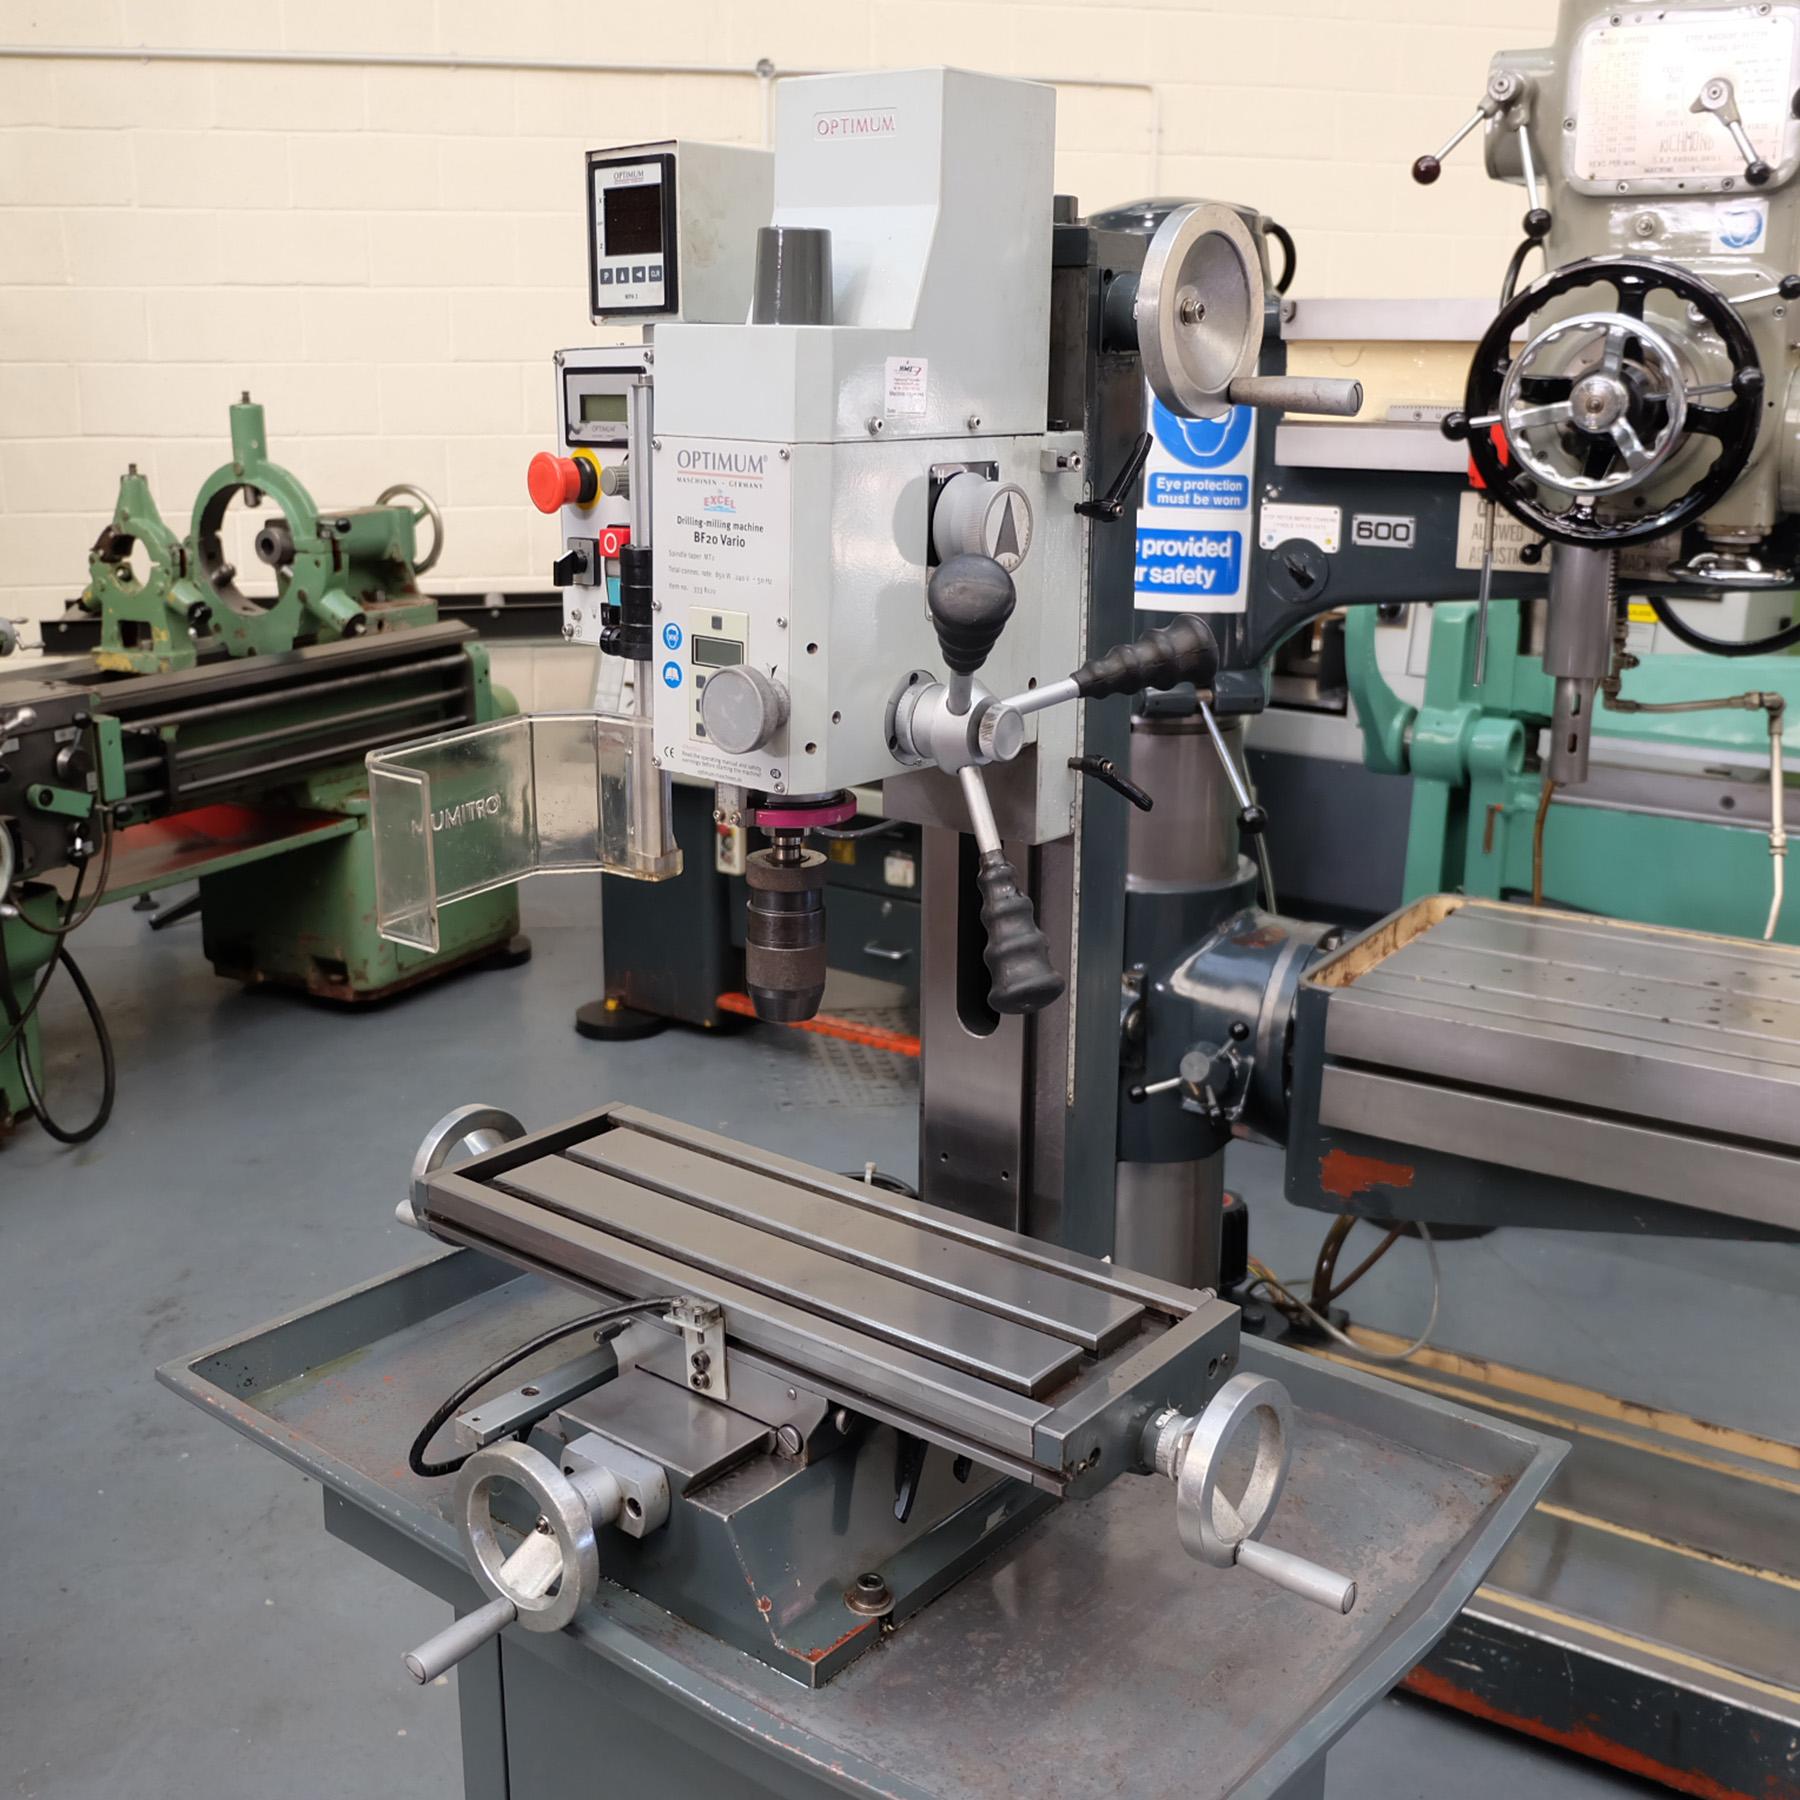 Optimum BF20 Vario Drilling/Milling Machine. - Image 2 of 11